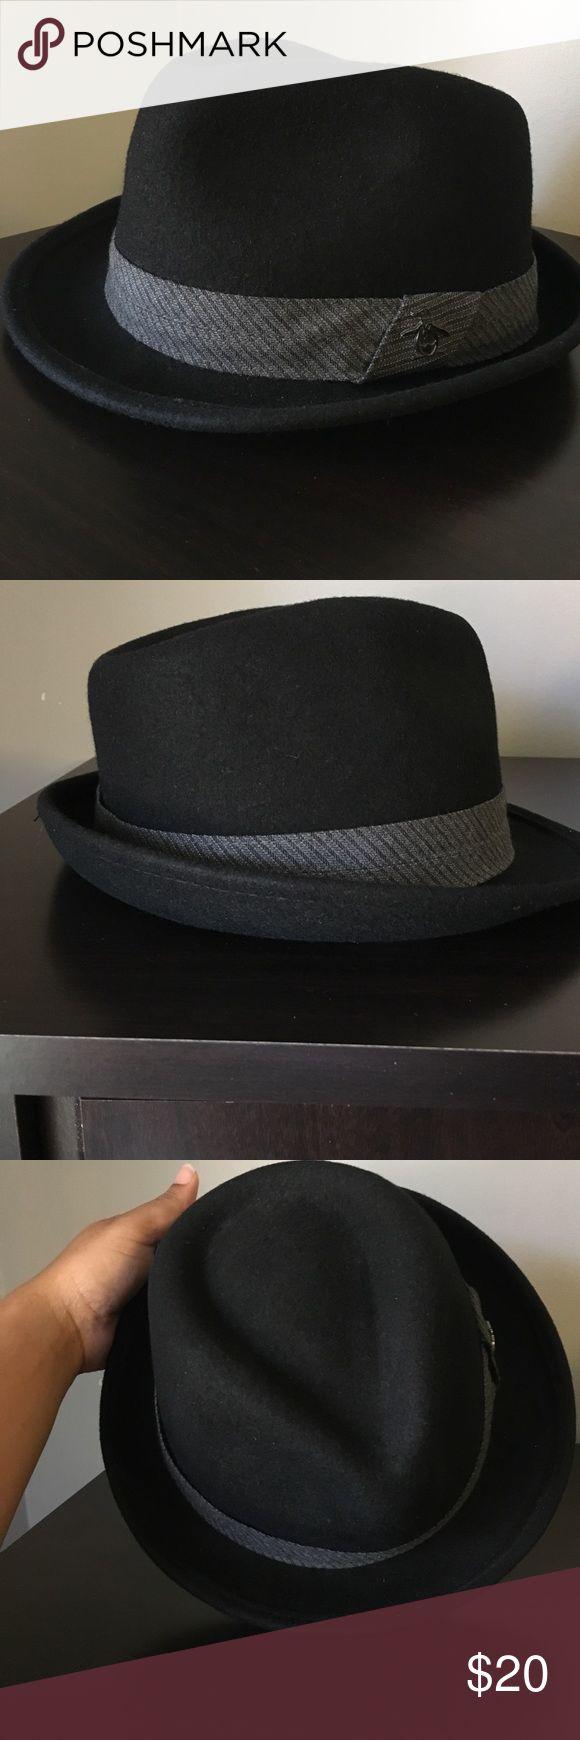 Men's fedora Original Penguin Brand Black Fedora with grey band. In great condition Original Penguin Accessories Hats